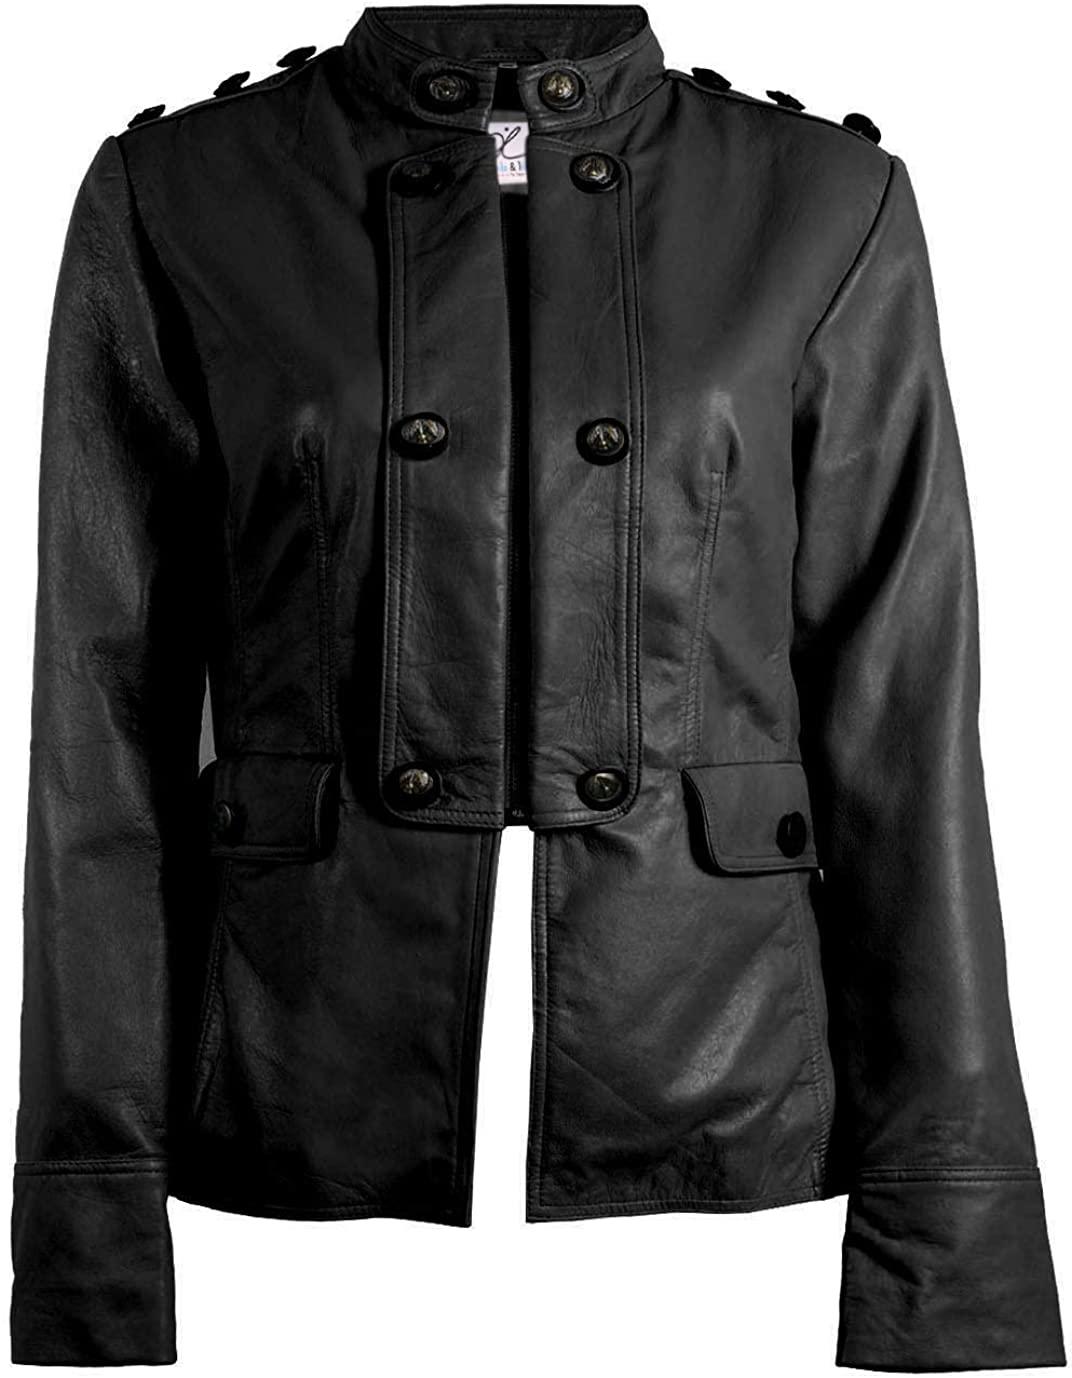 Trendz&ideas Nautical Black Azure Womens Leather Blazer